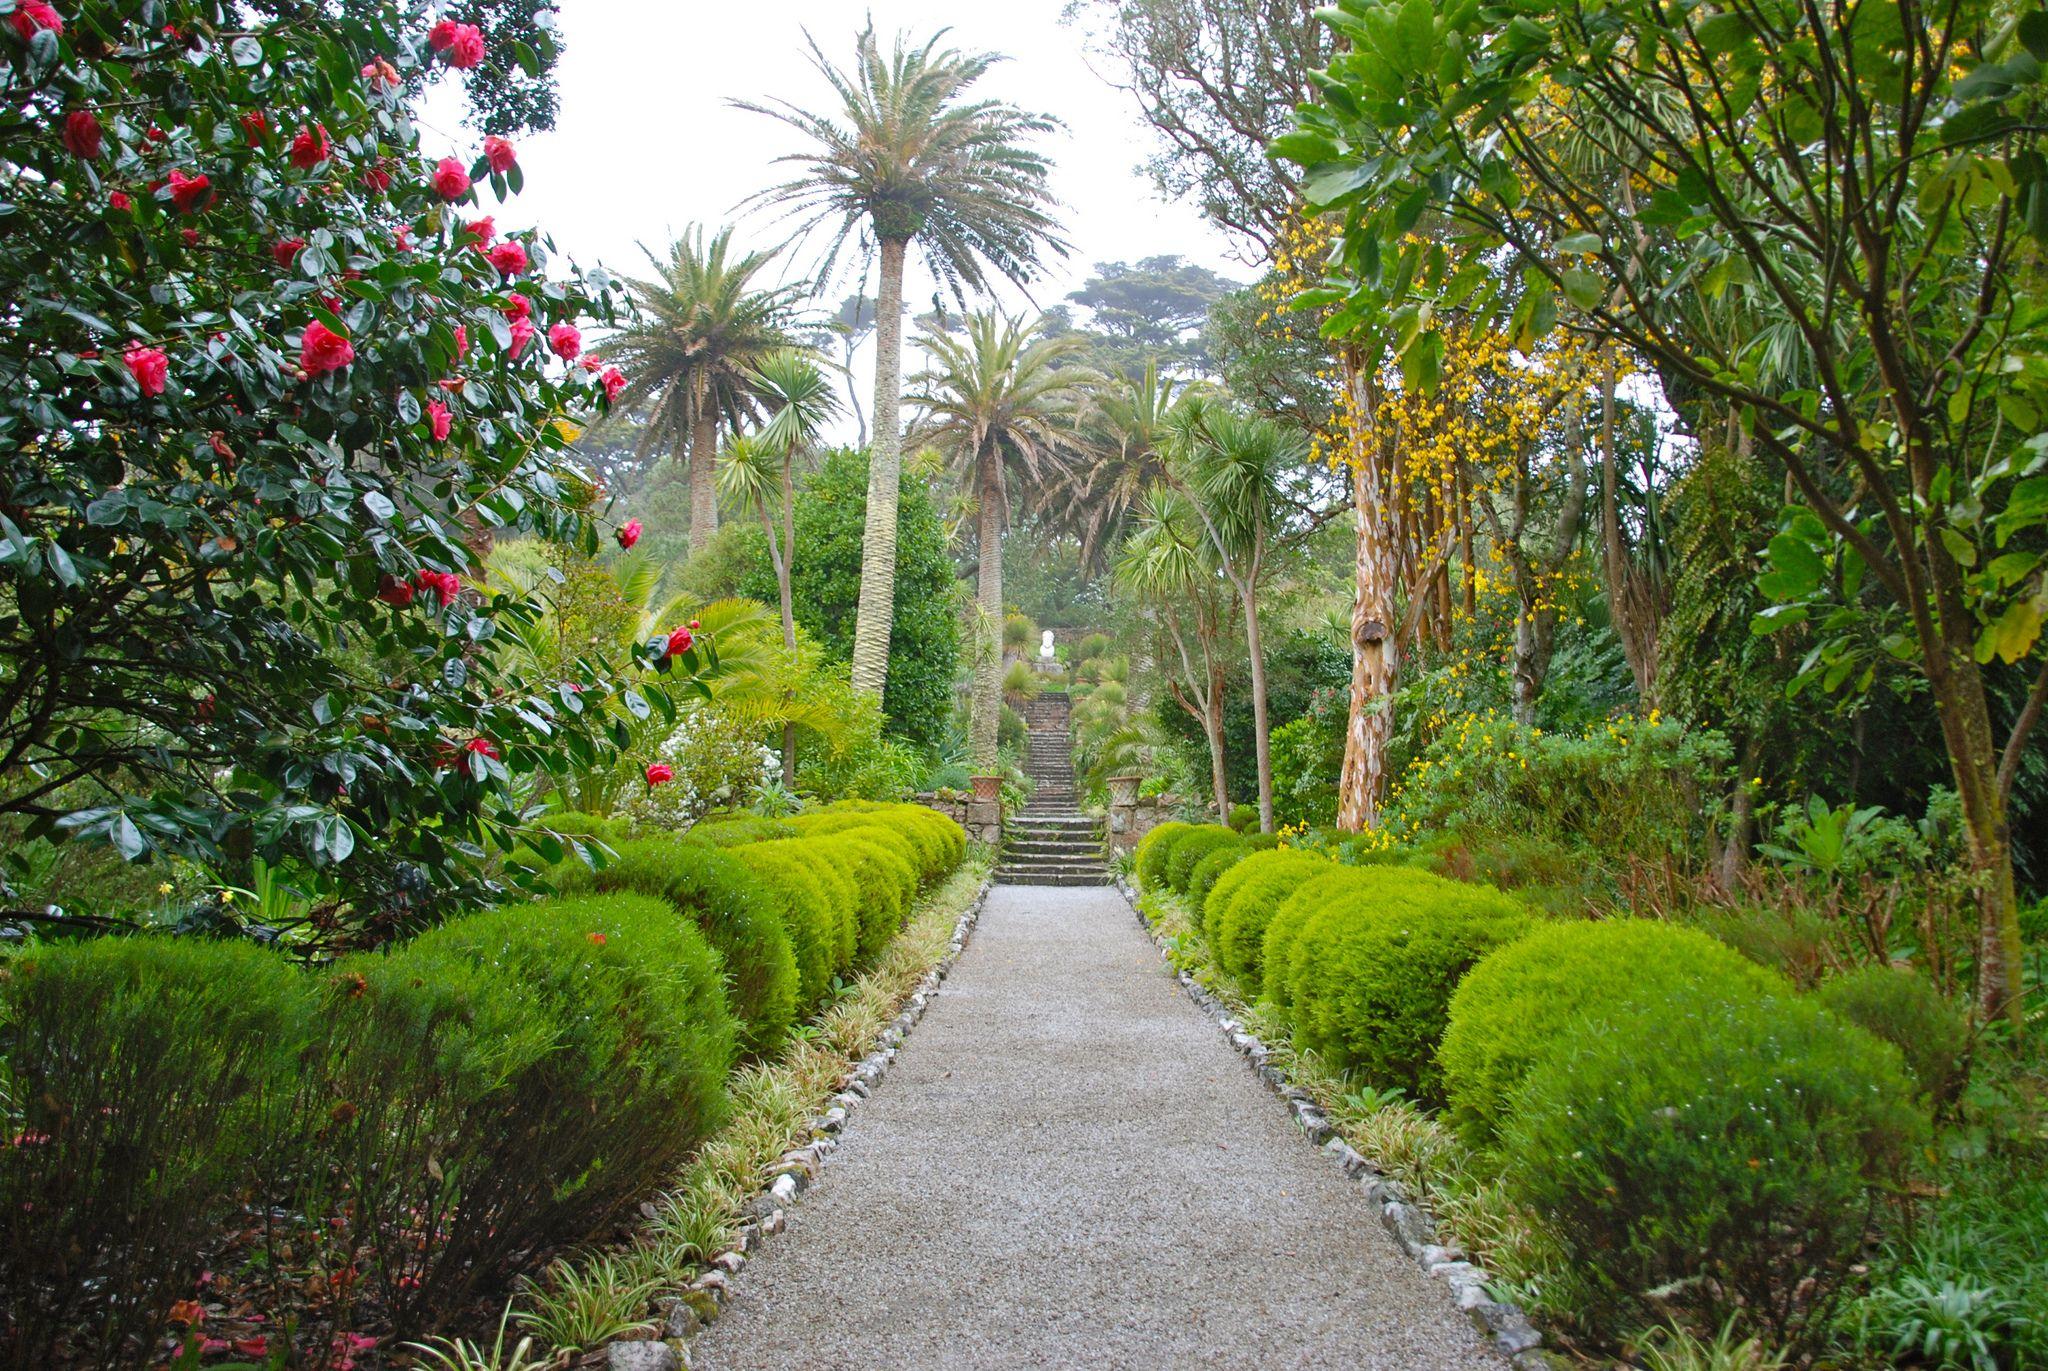 Path in Abbey Gardens, Tresco, Isles of Scilly, Cornwall, England ✯ ωнιмѕу ѕαη∂у